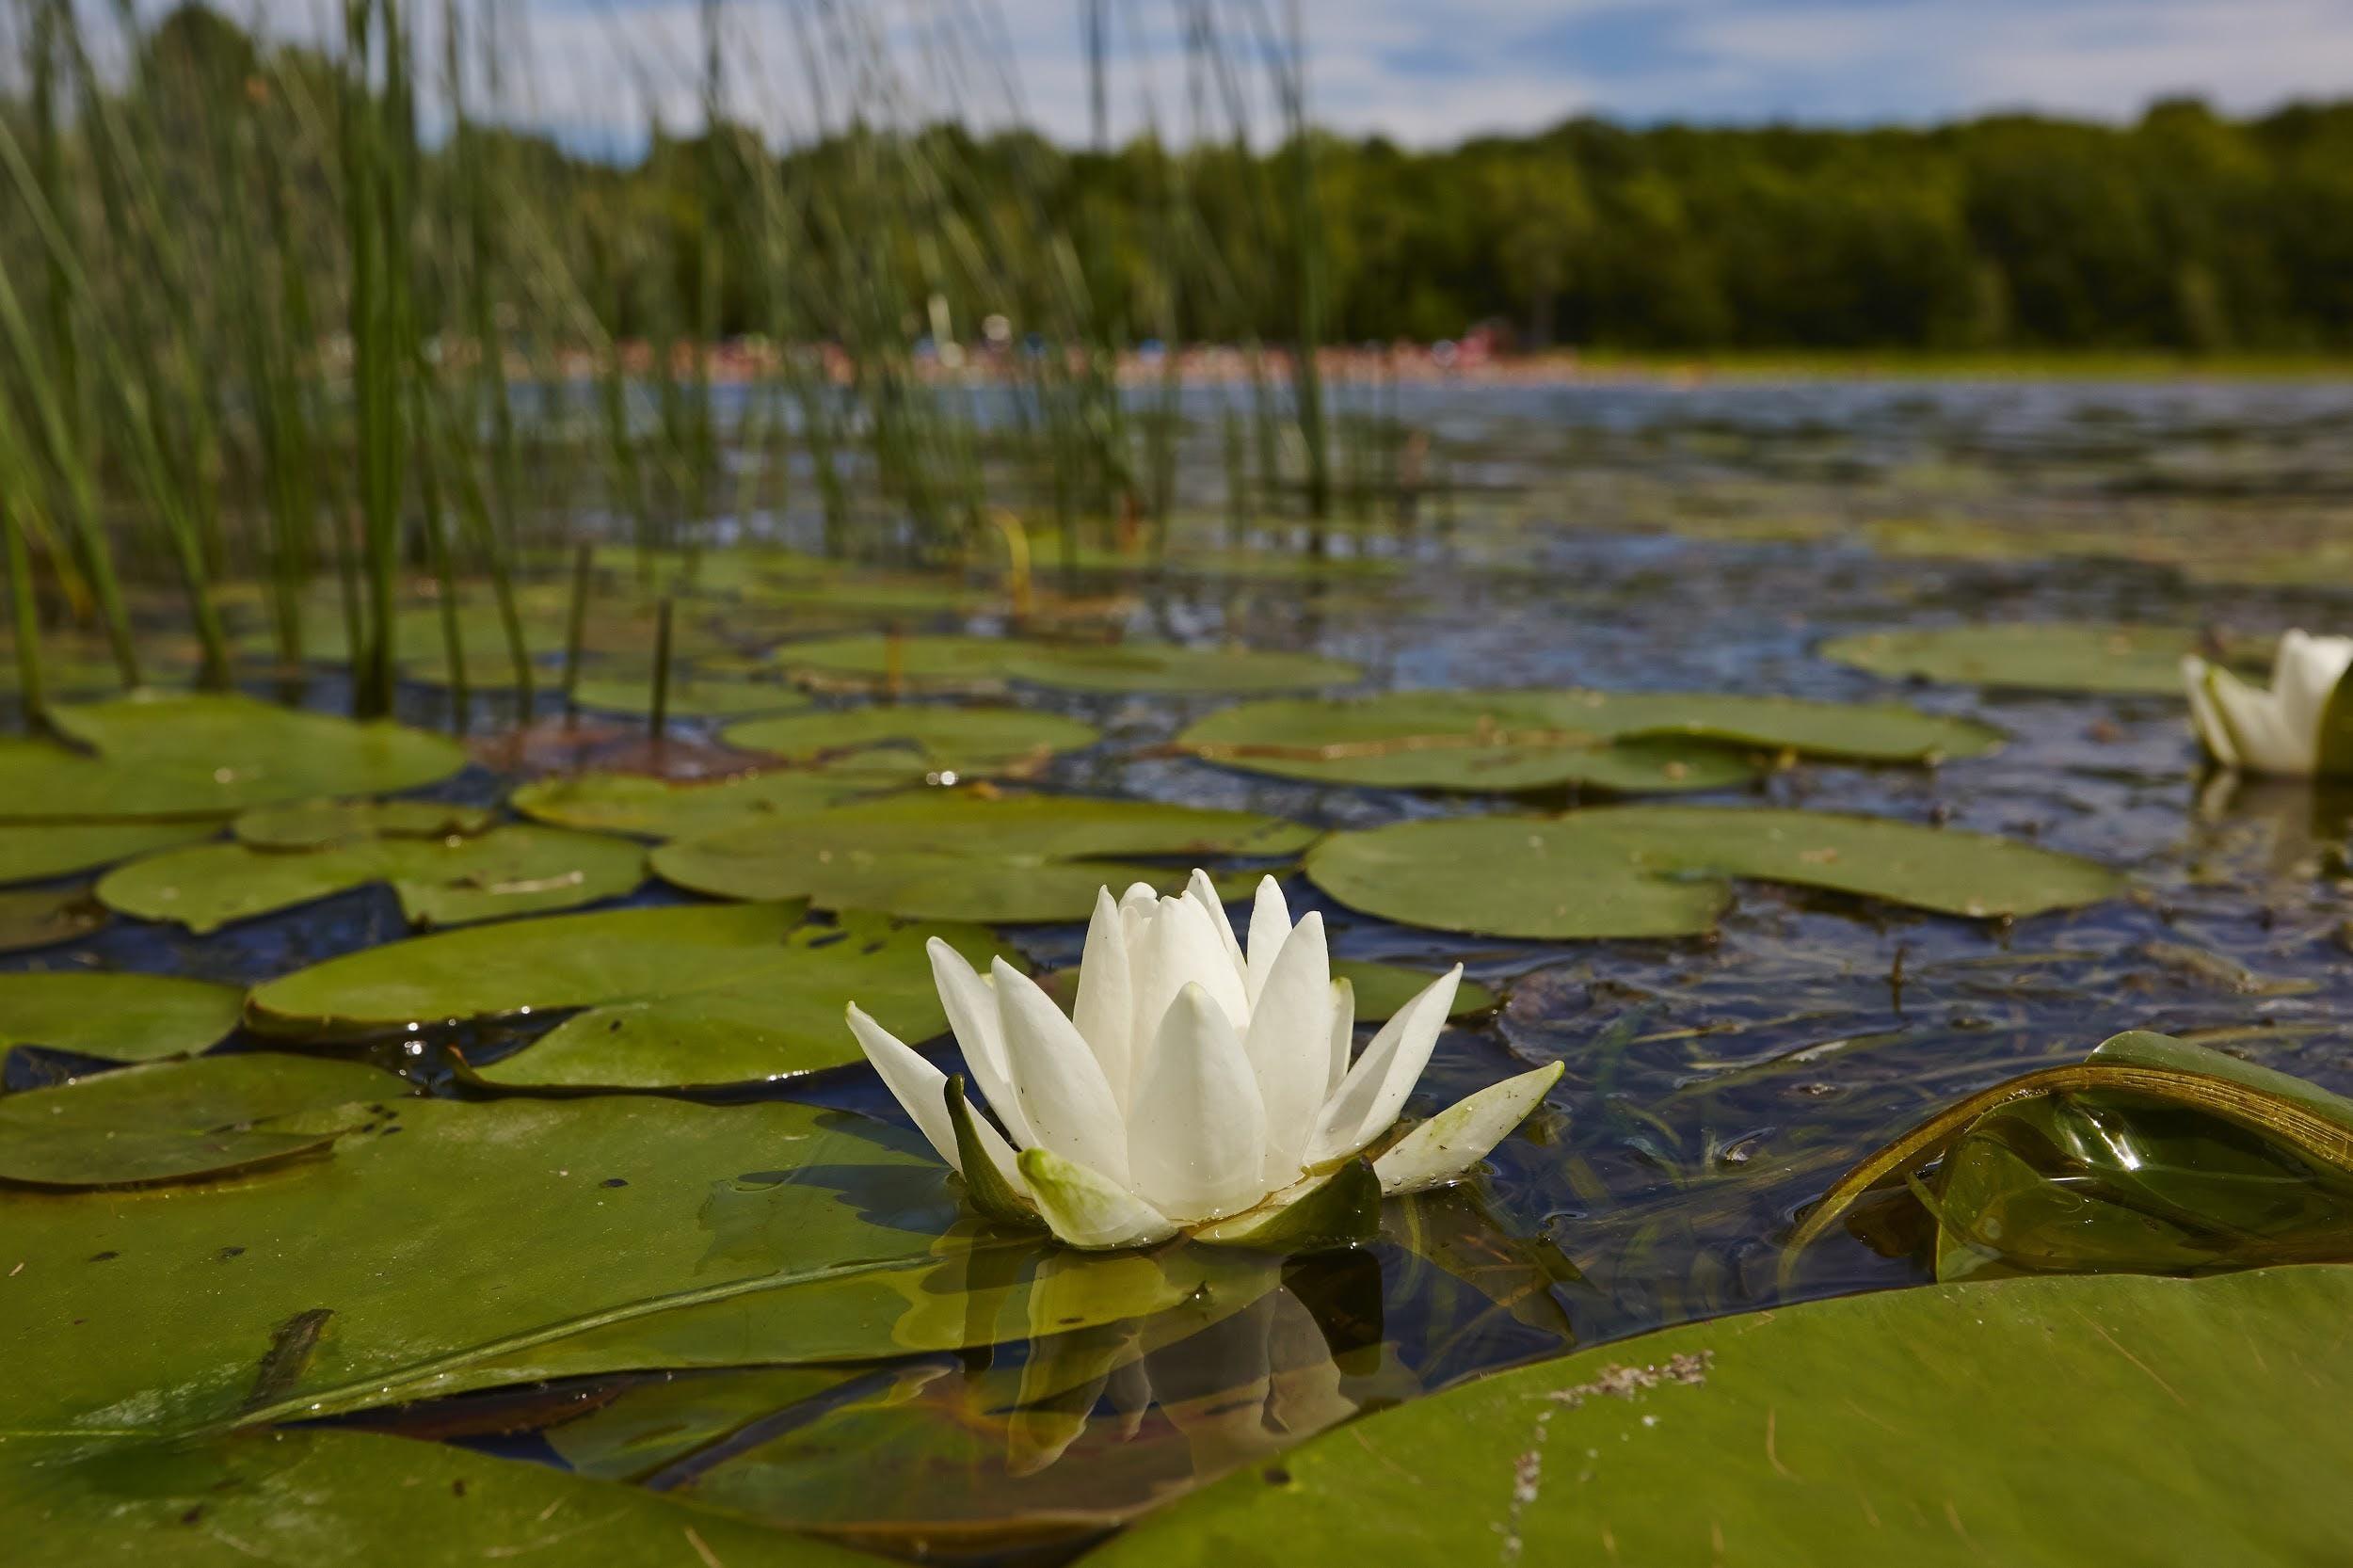 Protecting wetlands